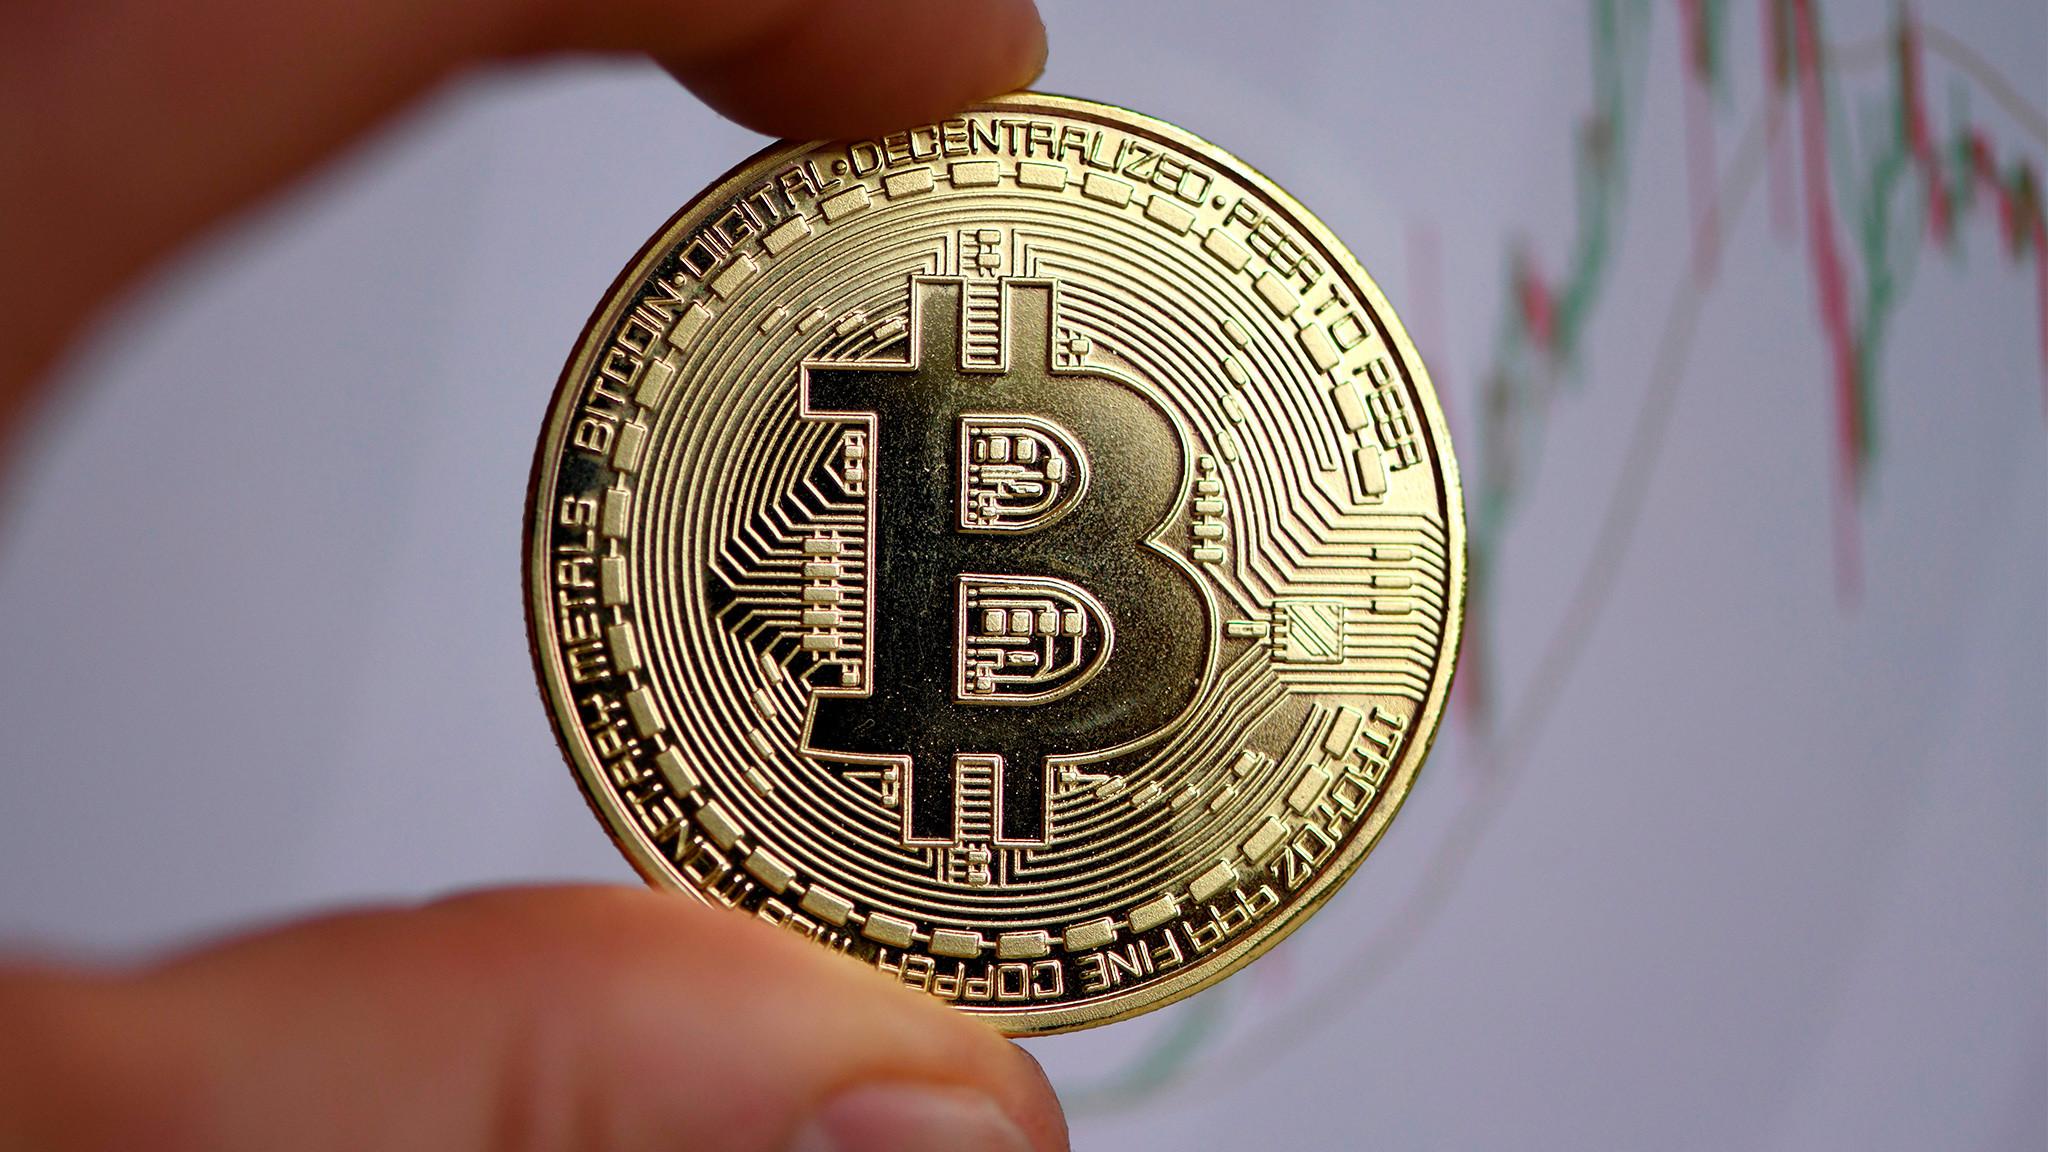 Über 66.000 US-Dollar: Bitcoin knackt Rekordgrenze